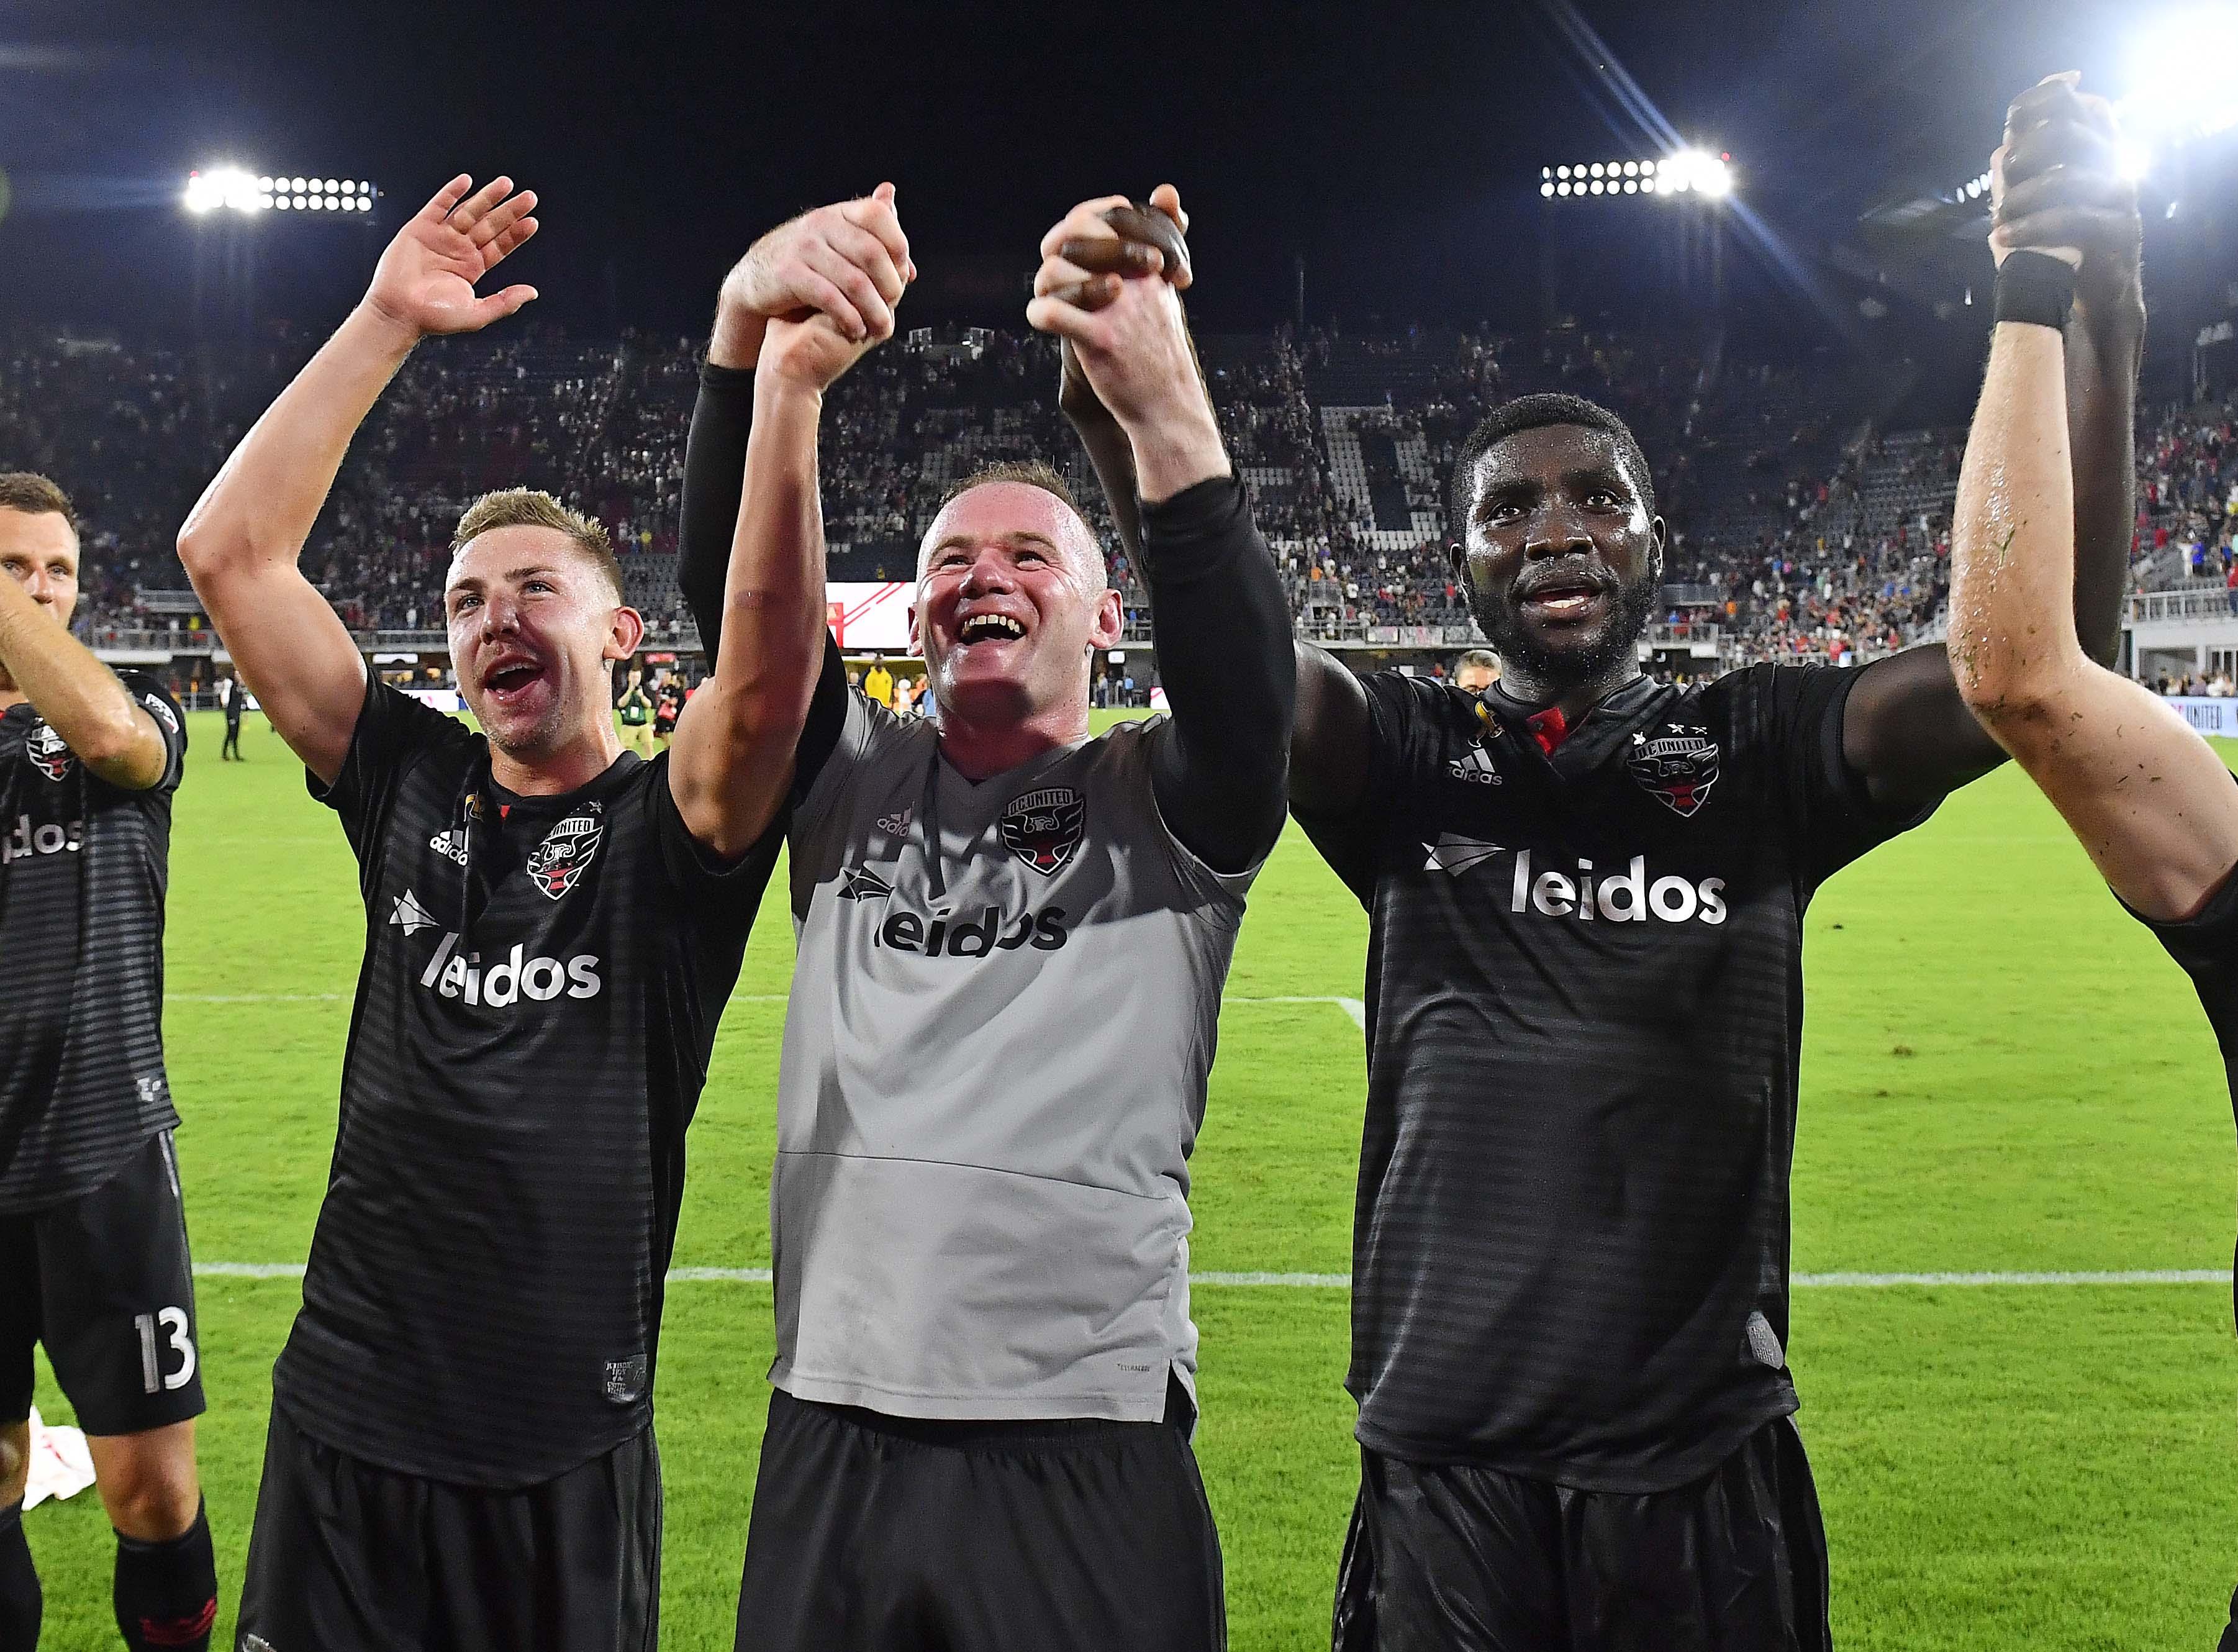 MLS: Atlanta United FC at D.C. United